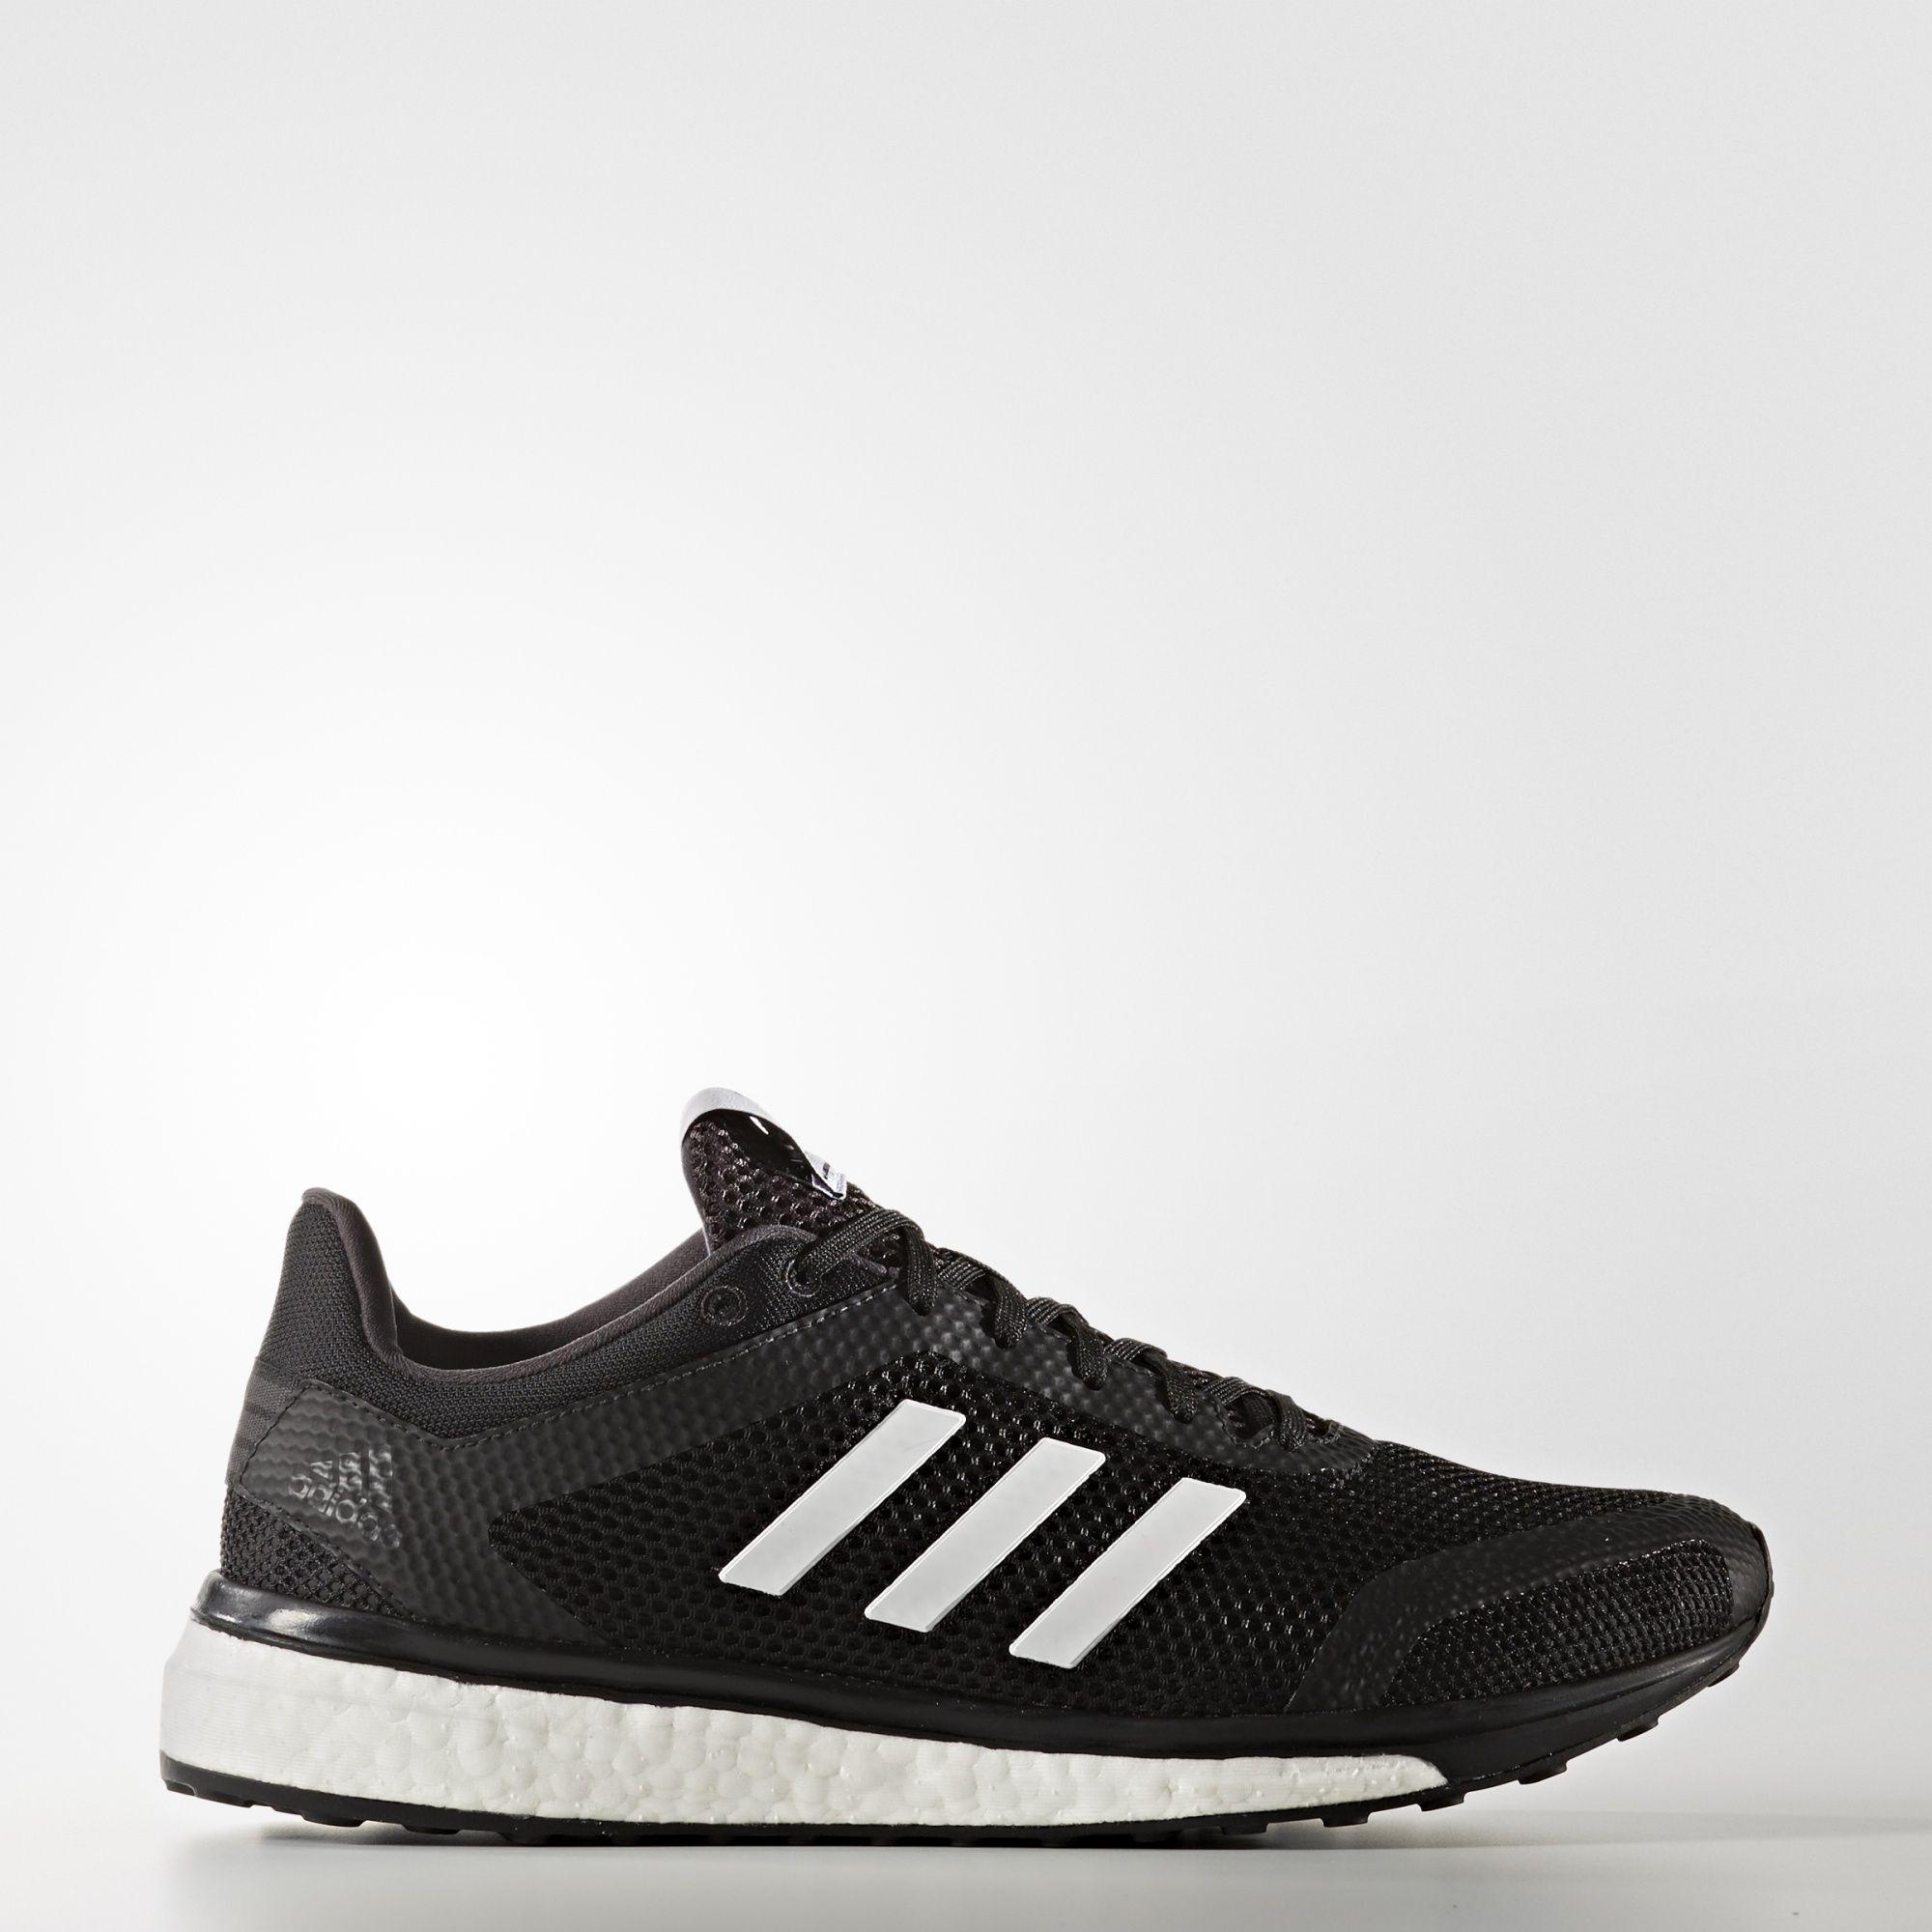 newest collection 016e7 214d7 Experimenta una pisada amortiguada y sensible de principio a fin con este  calzado de running para